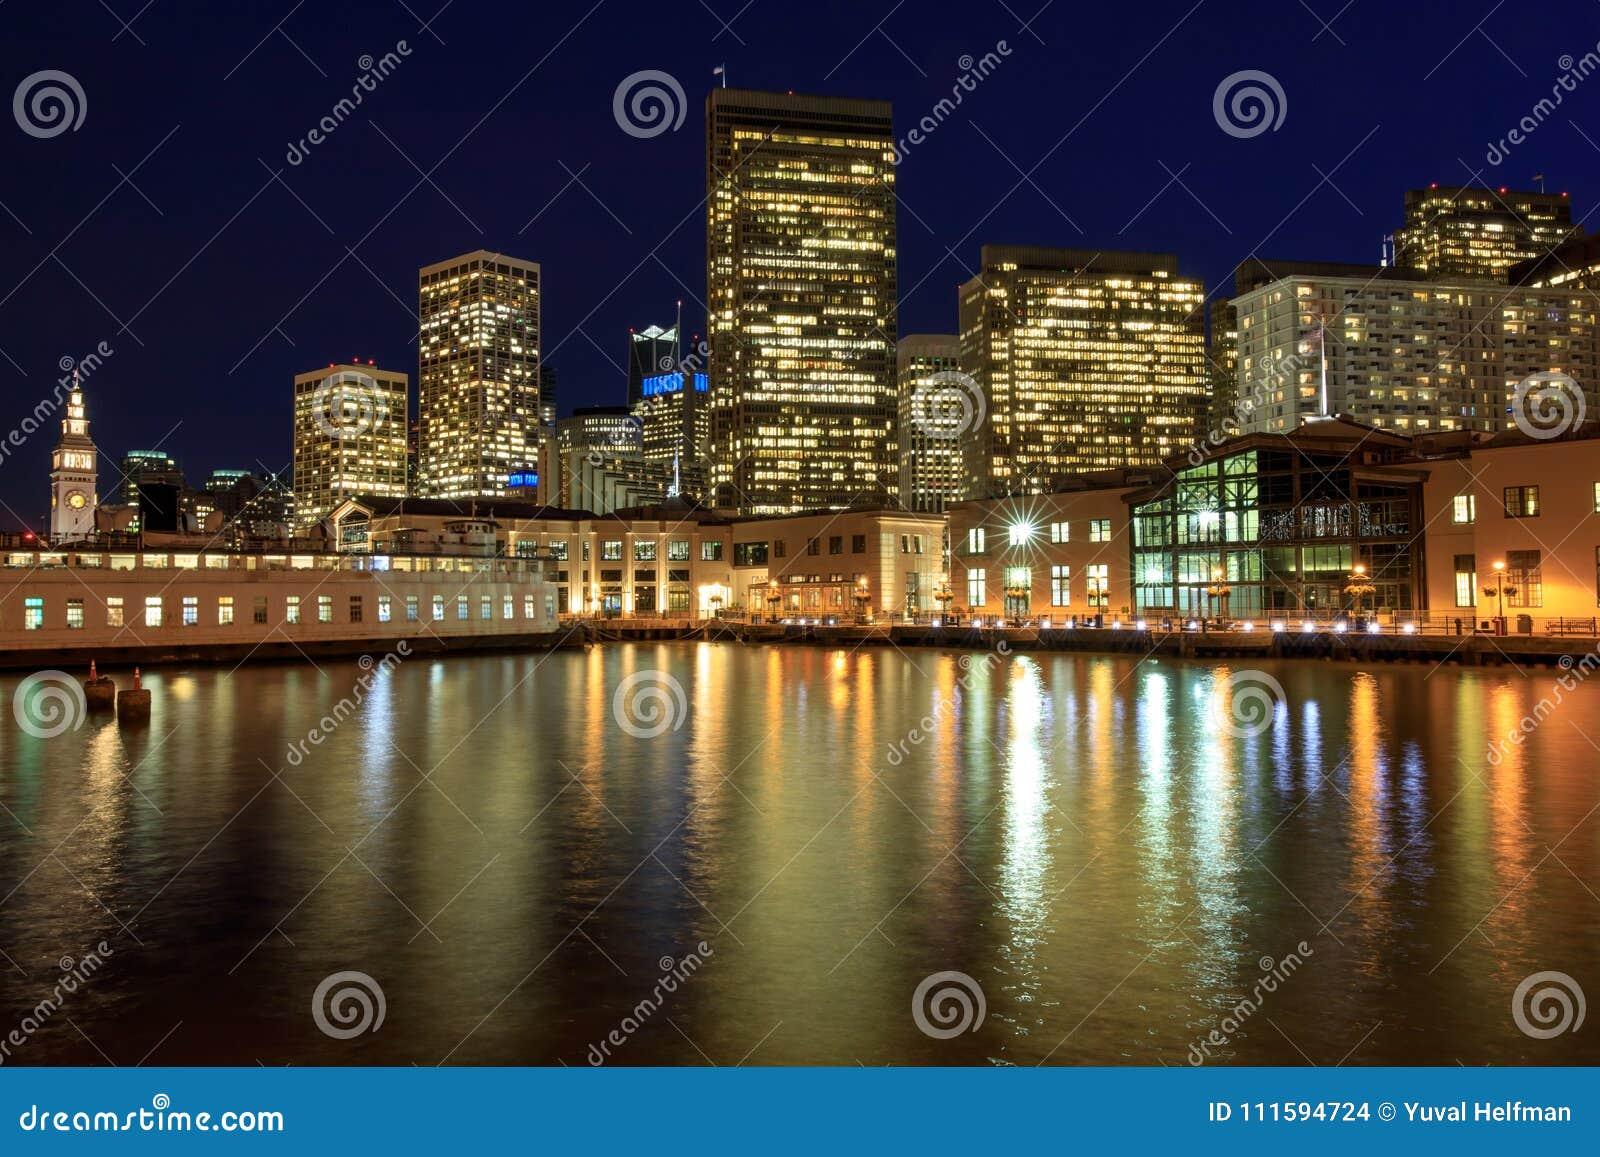 San Francisco Waterfront From The Embarcadero  Stock Photo - Image